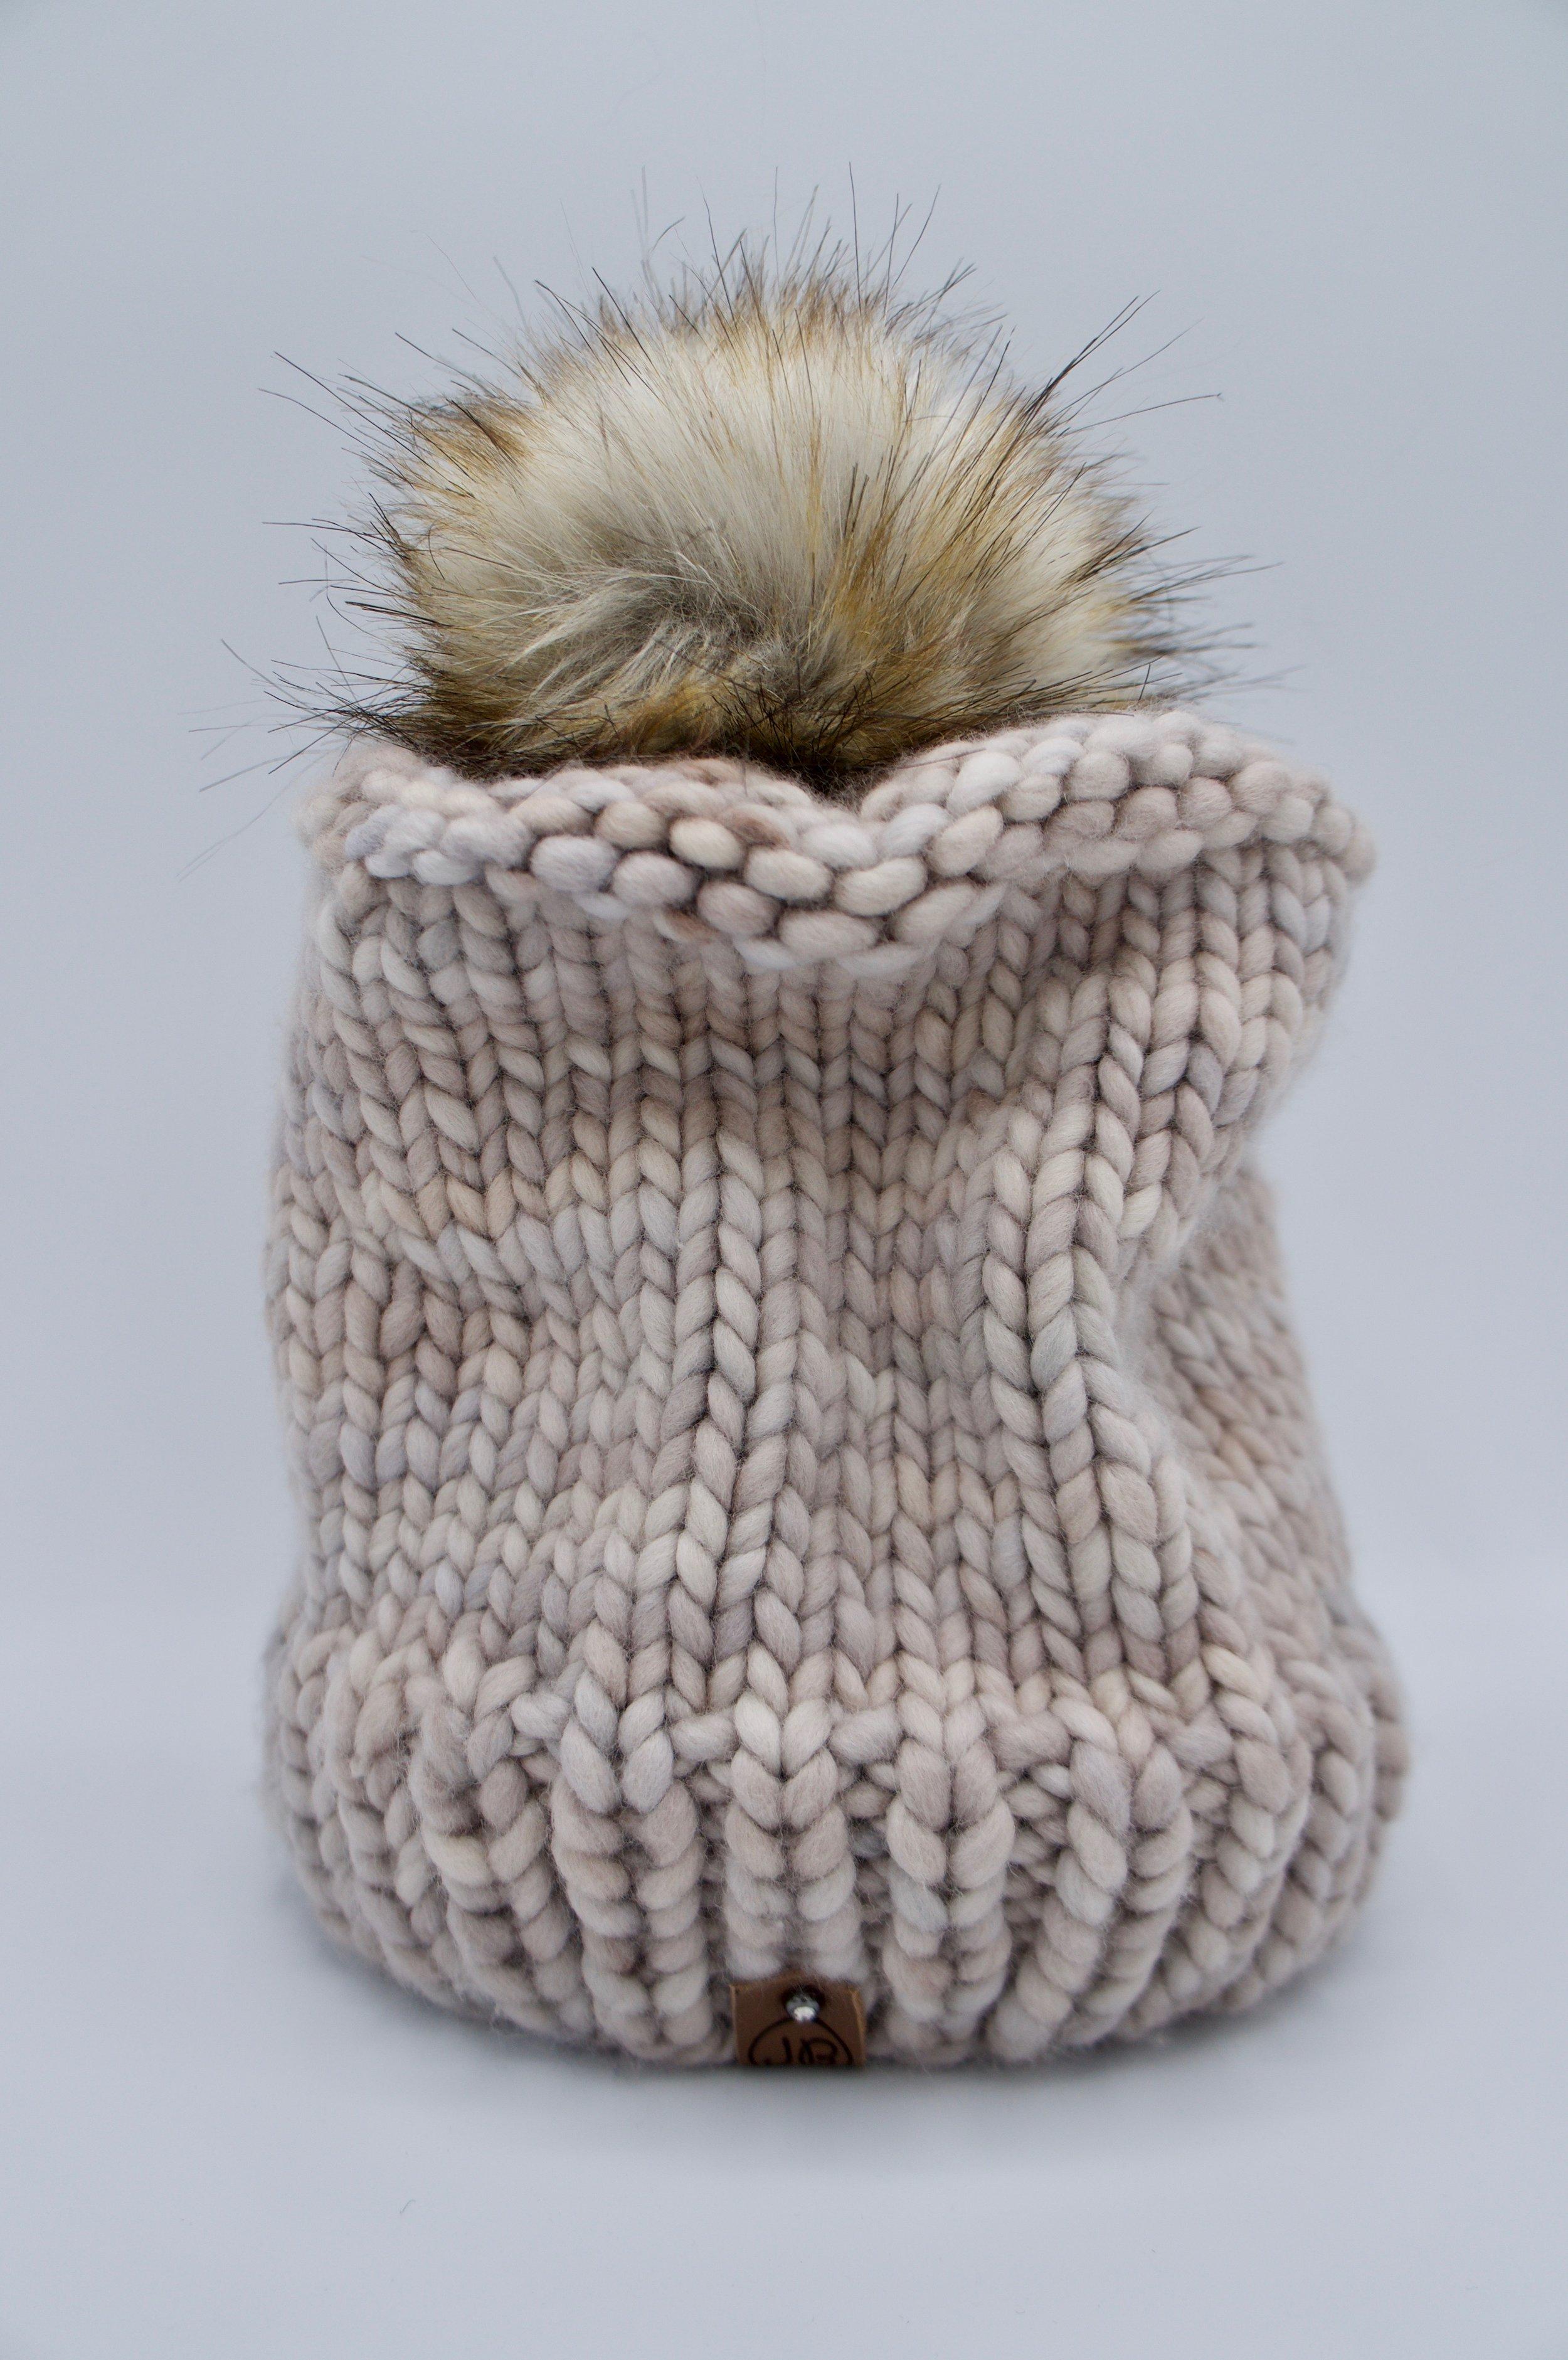 Chic Winter Hat with Detachable Pompom Whole Grain $125.00